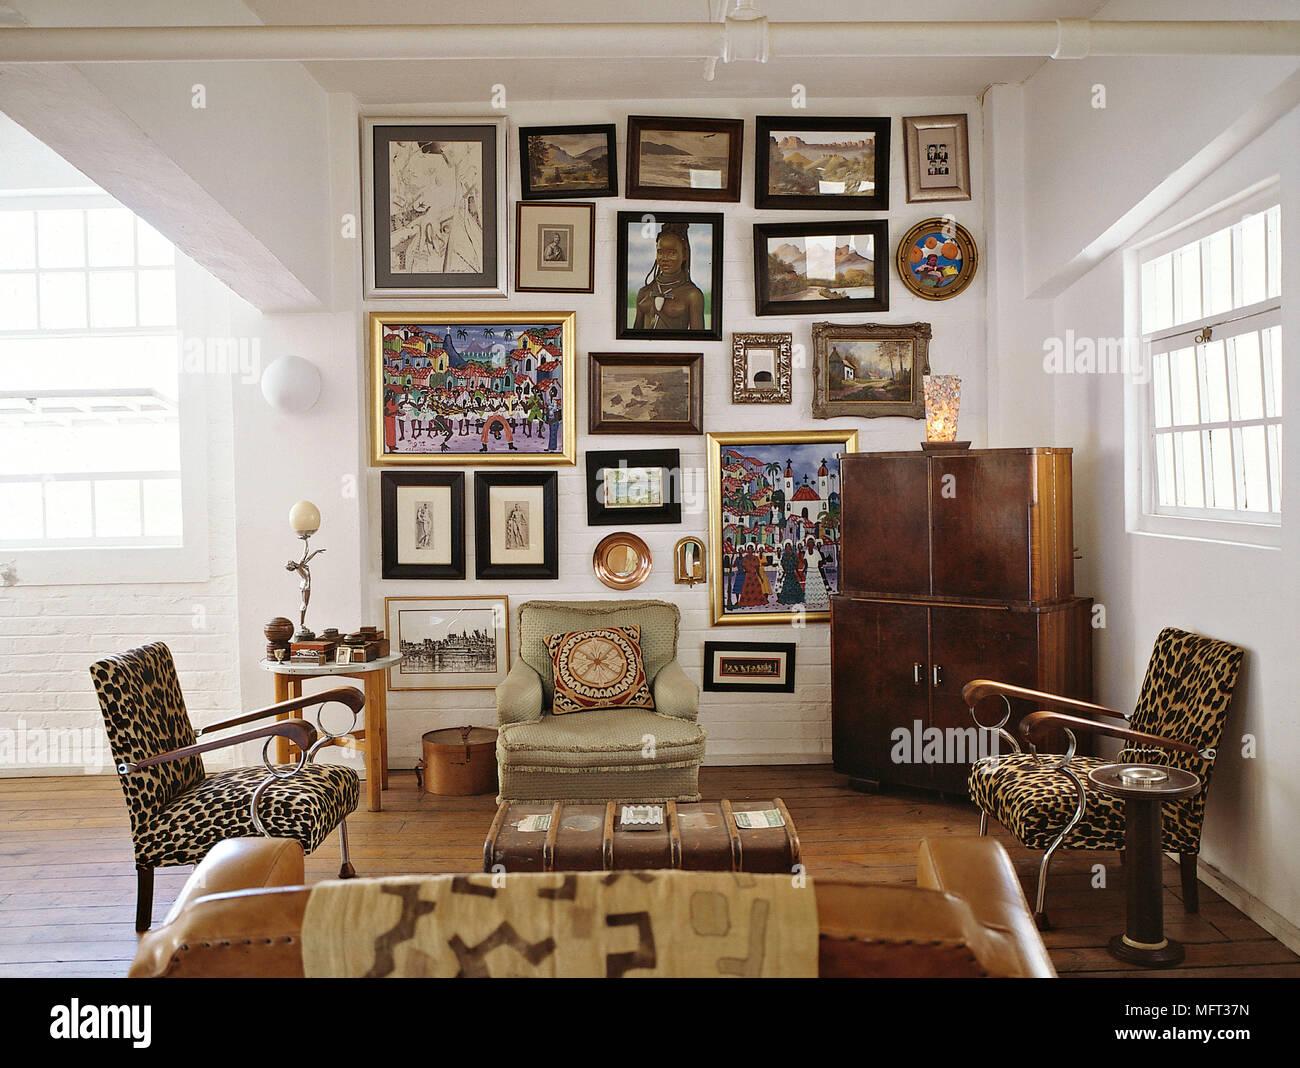 Moderne Wohnzimmer gepolsterte Sessel tierdruck Stoff leder Sofa ...